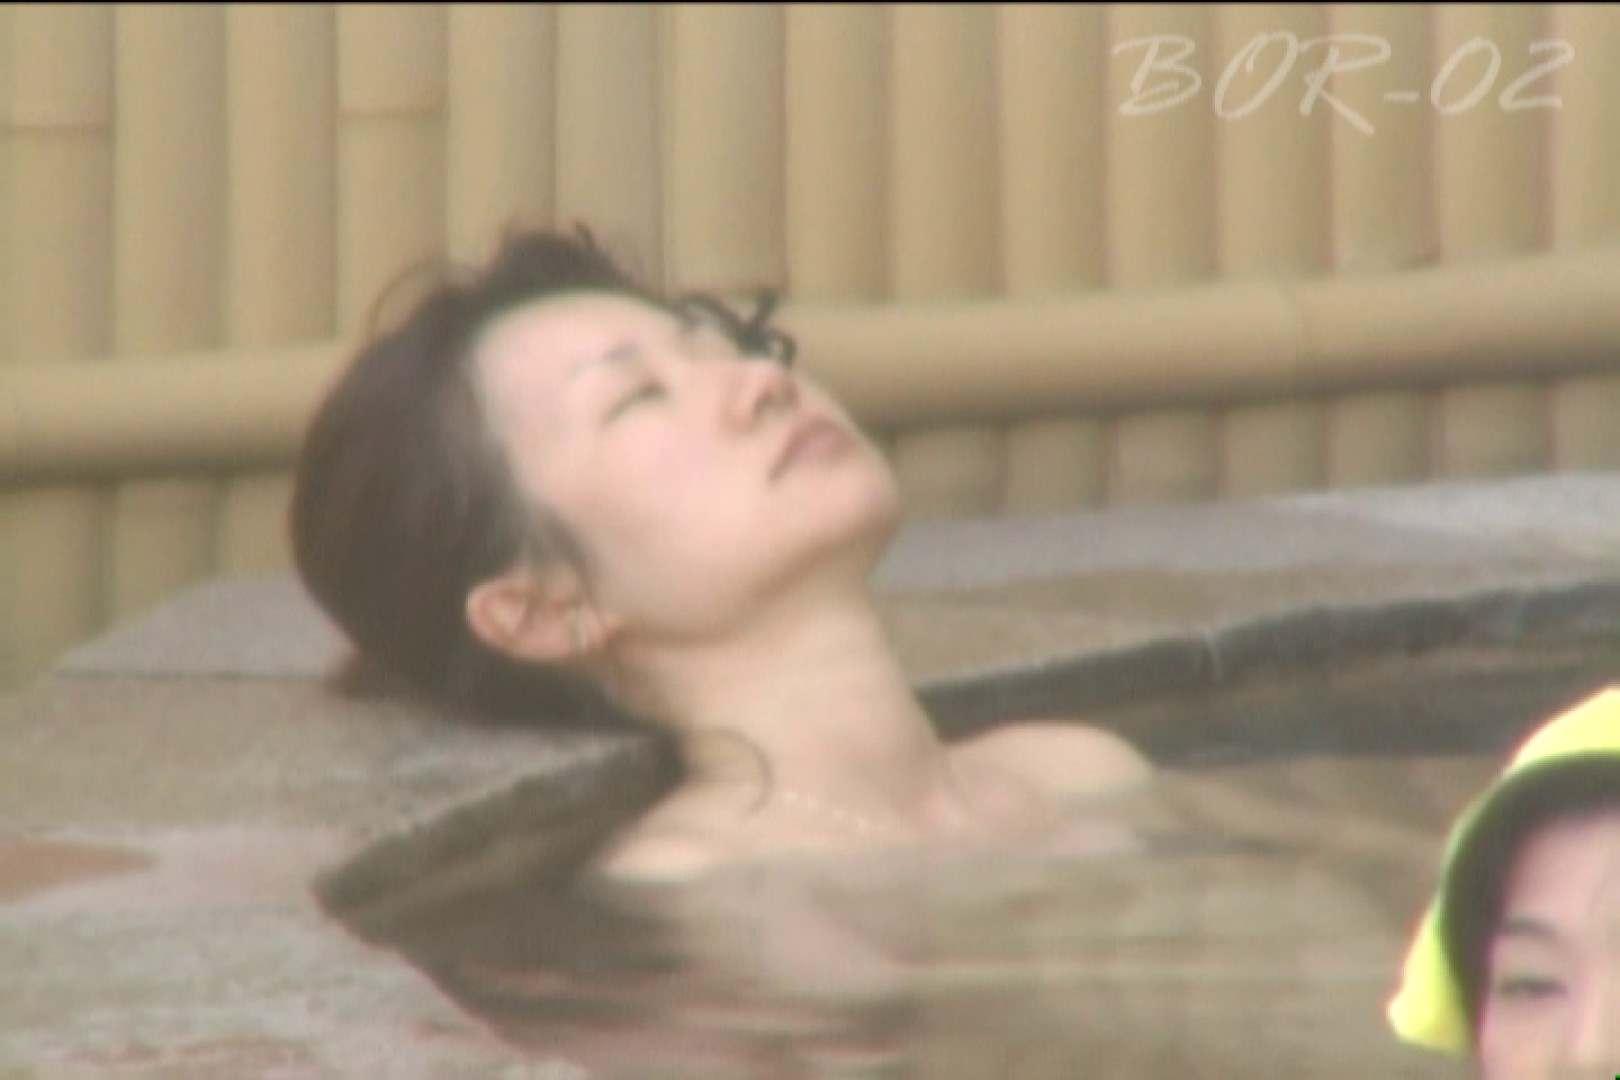 Aquaな露天風呂Vol.477 OLセックス 盗撮われめAV動画紹介 86画像 32